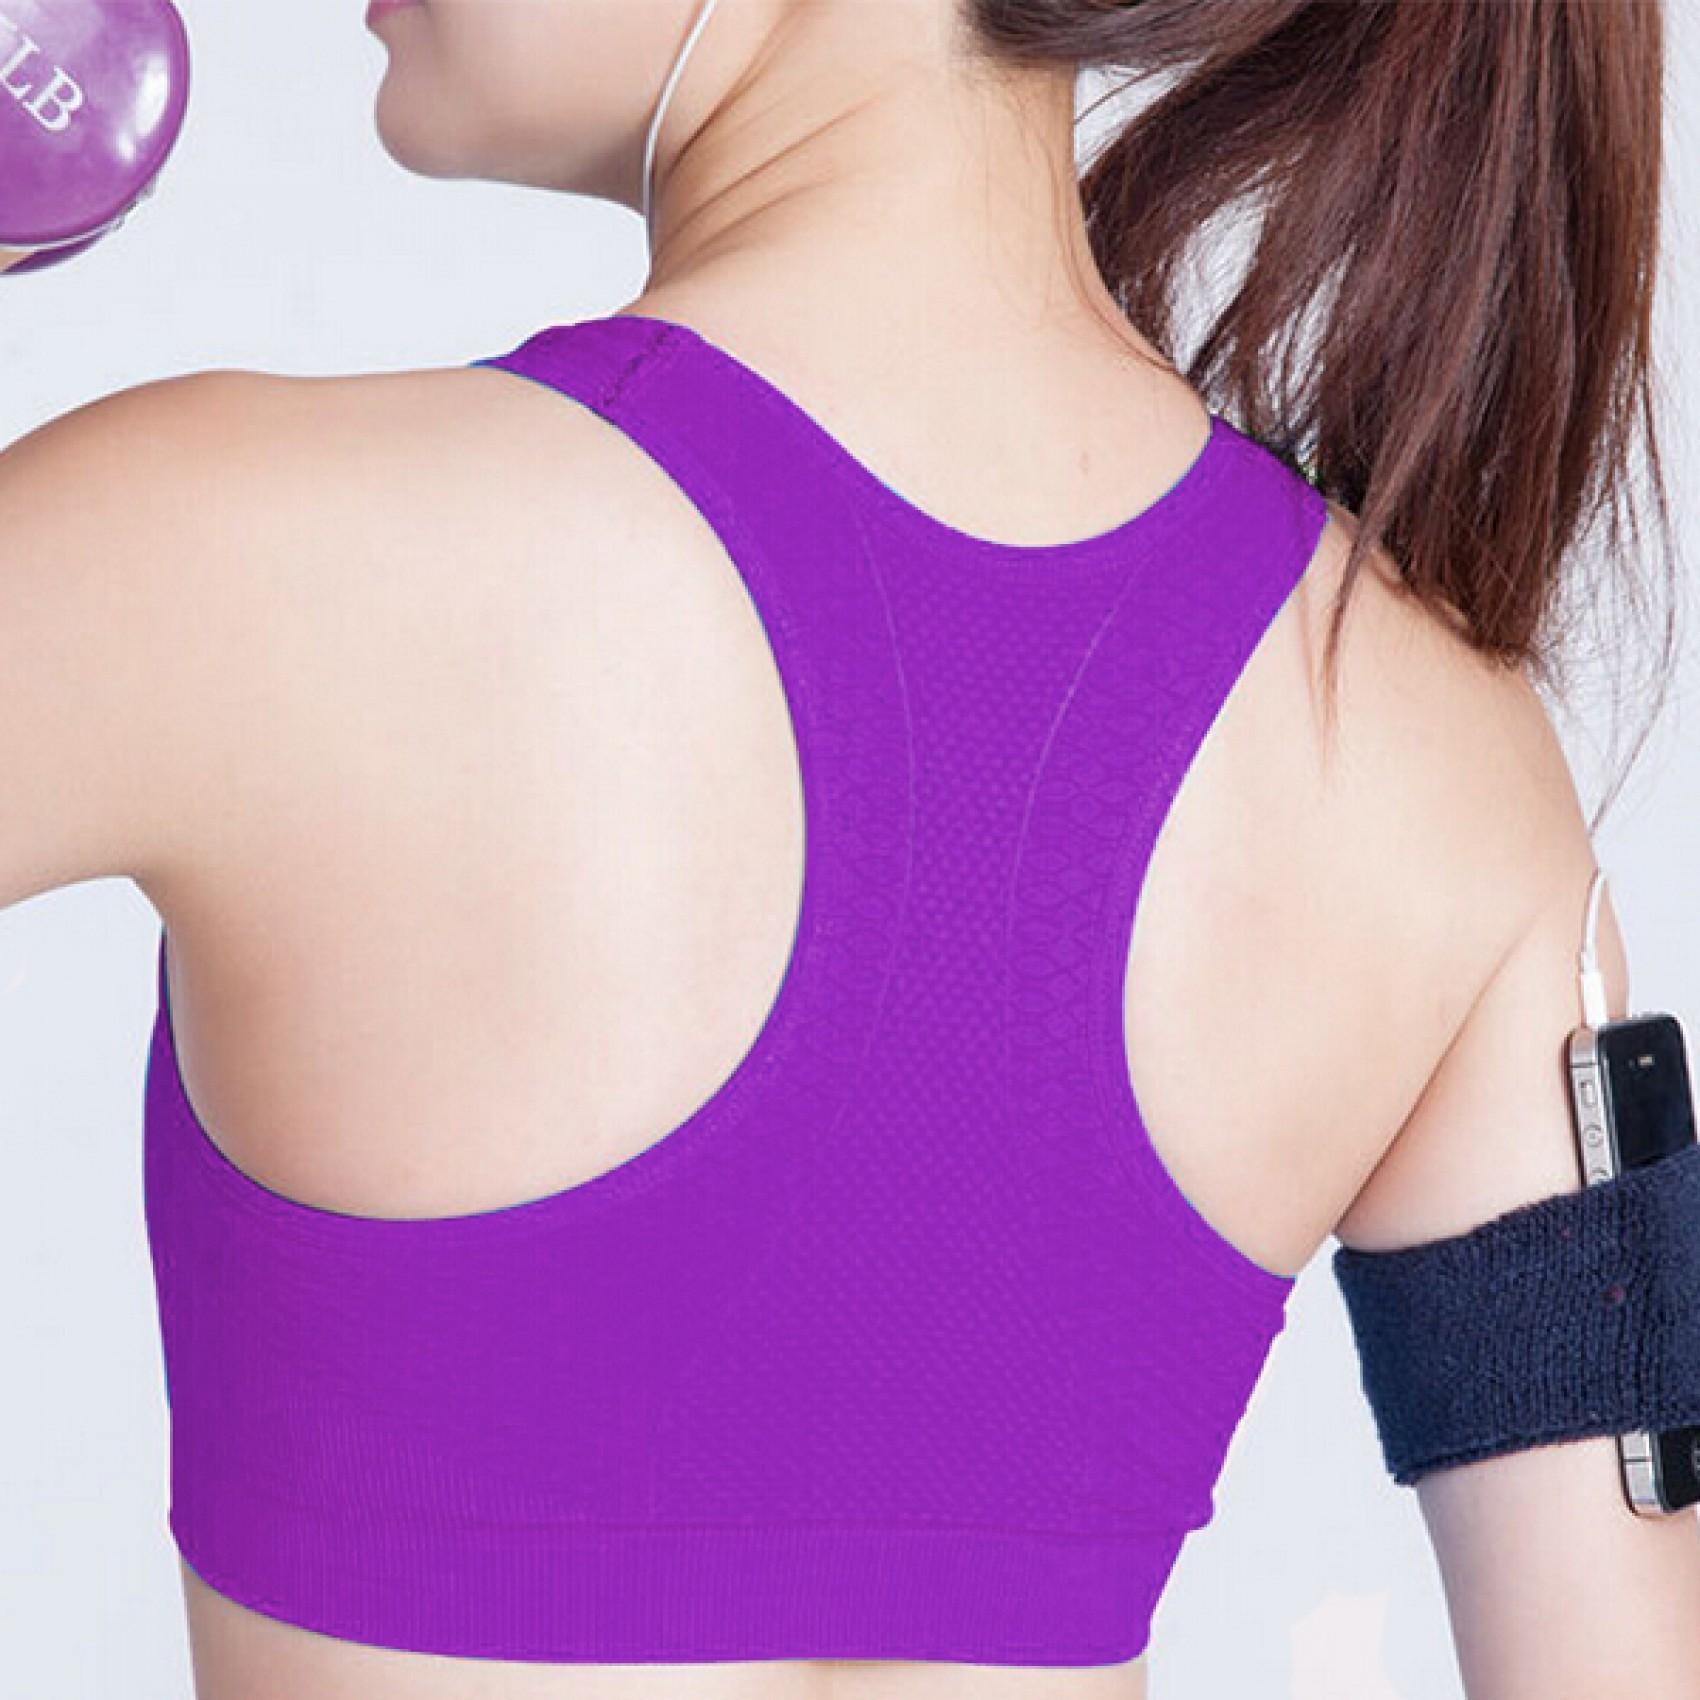 Female Sport Bra Medium - Violet